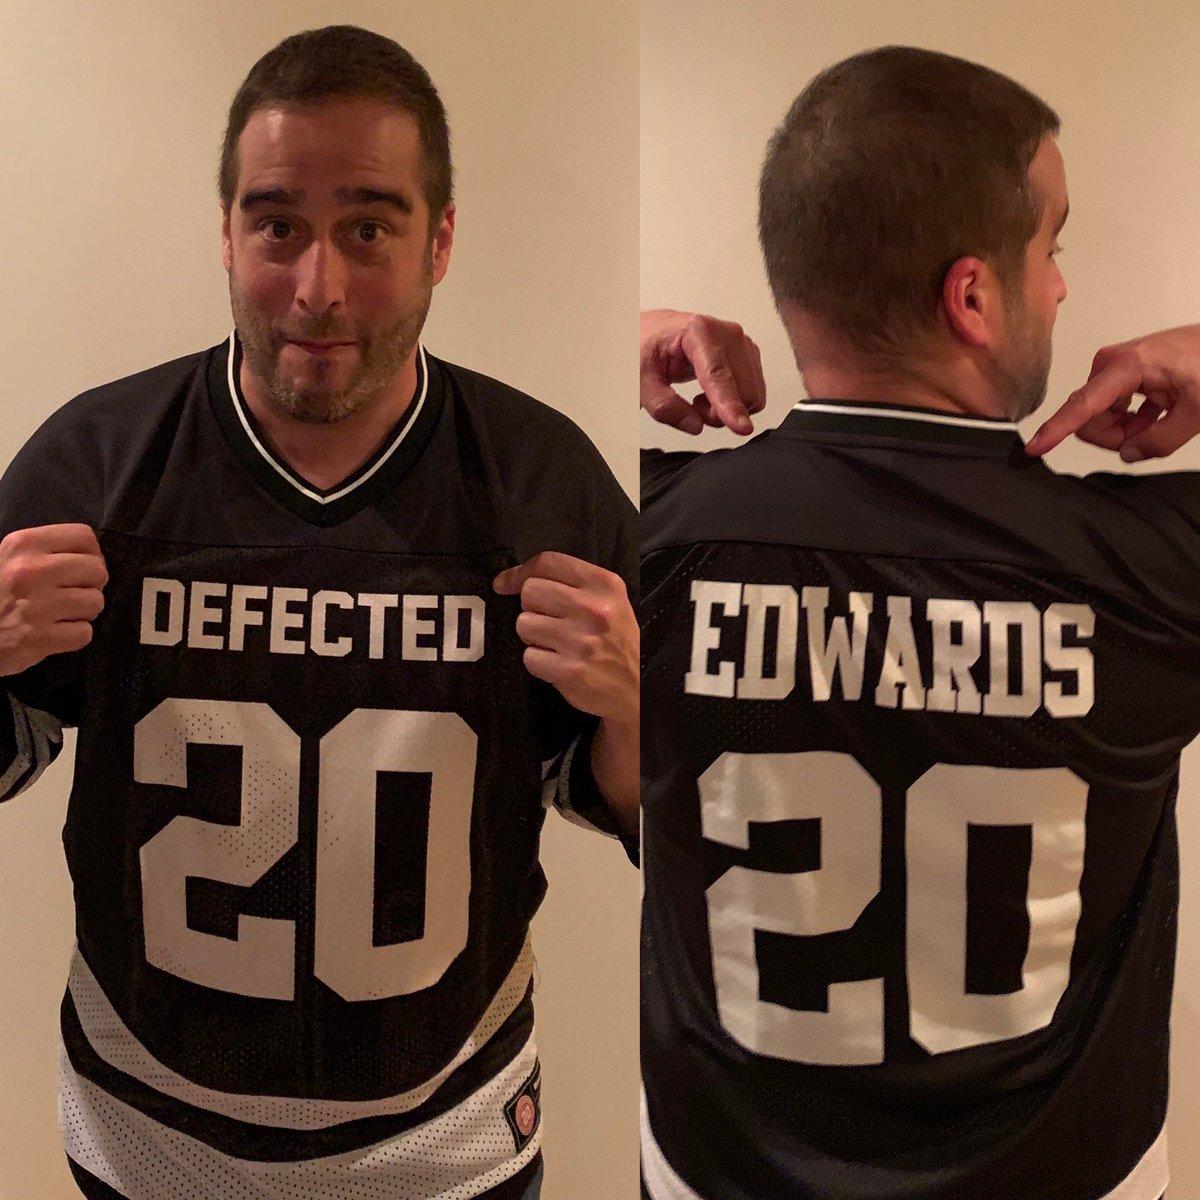 Much love to @DefectedRecords for sending me this personalised jersey, I love it! #defectedrecords #housemusic <br>http://pic.twitter.com/jzLfiN0dSQ